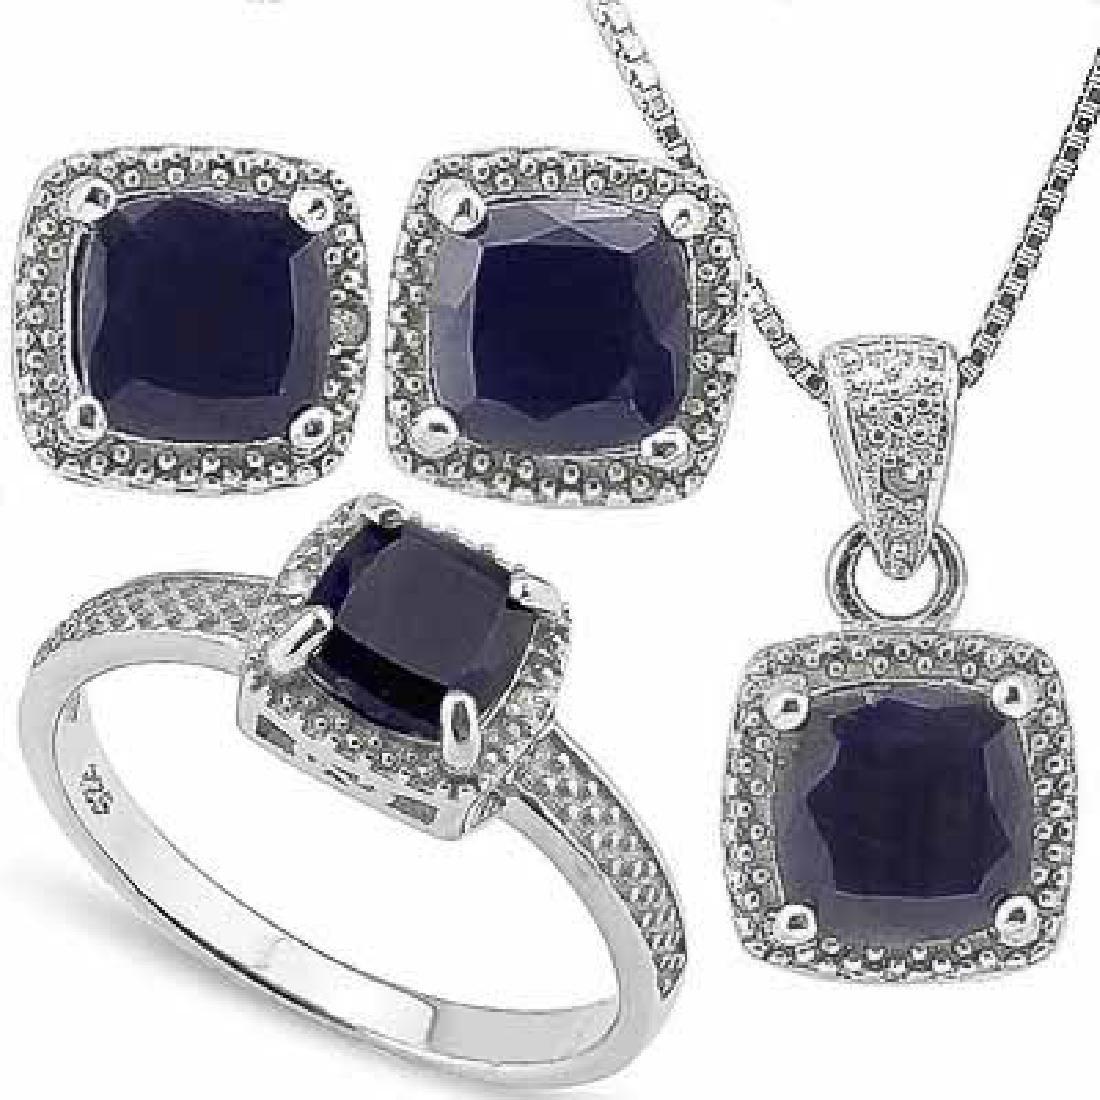 4 3/5 CARAT BLACK SAPPHIRE & DIAMOND 925 STERLING SILVE